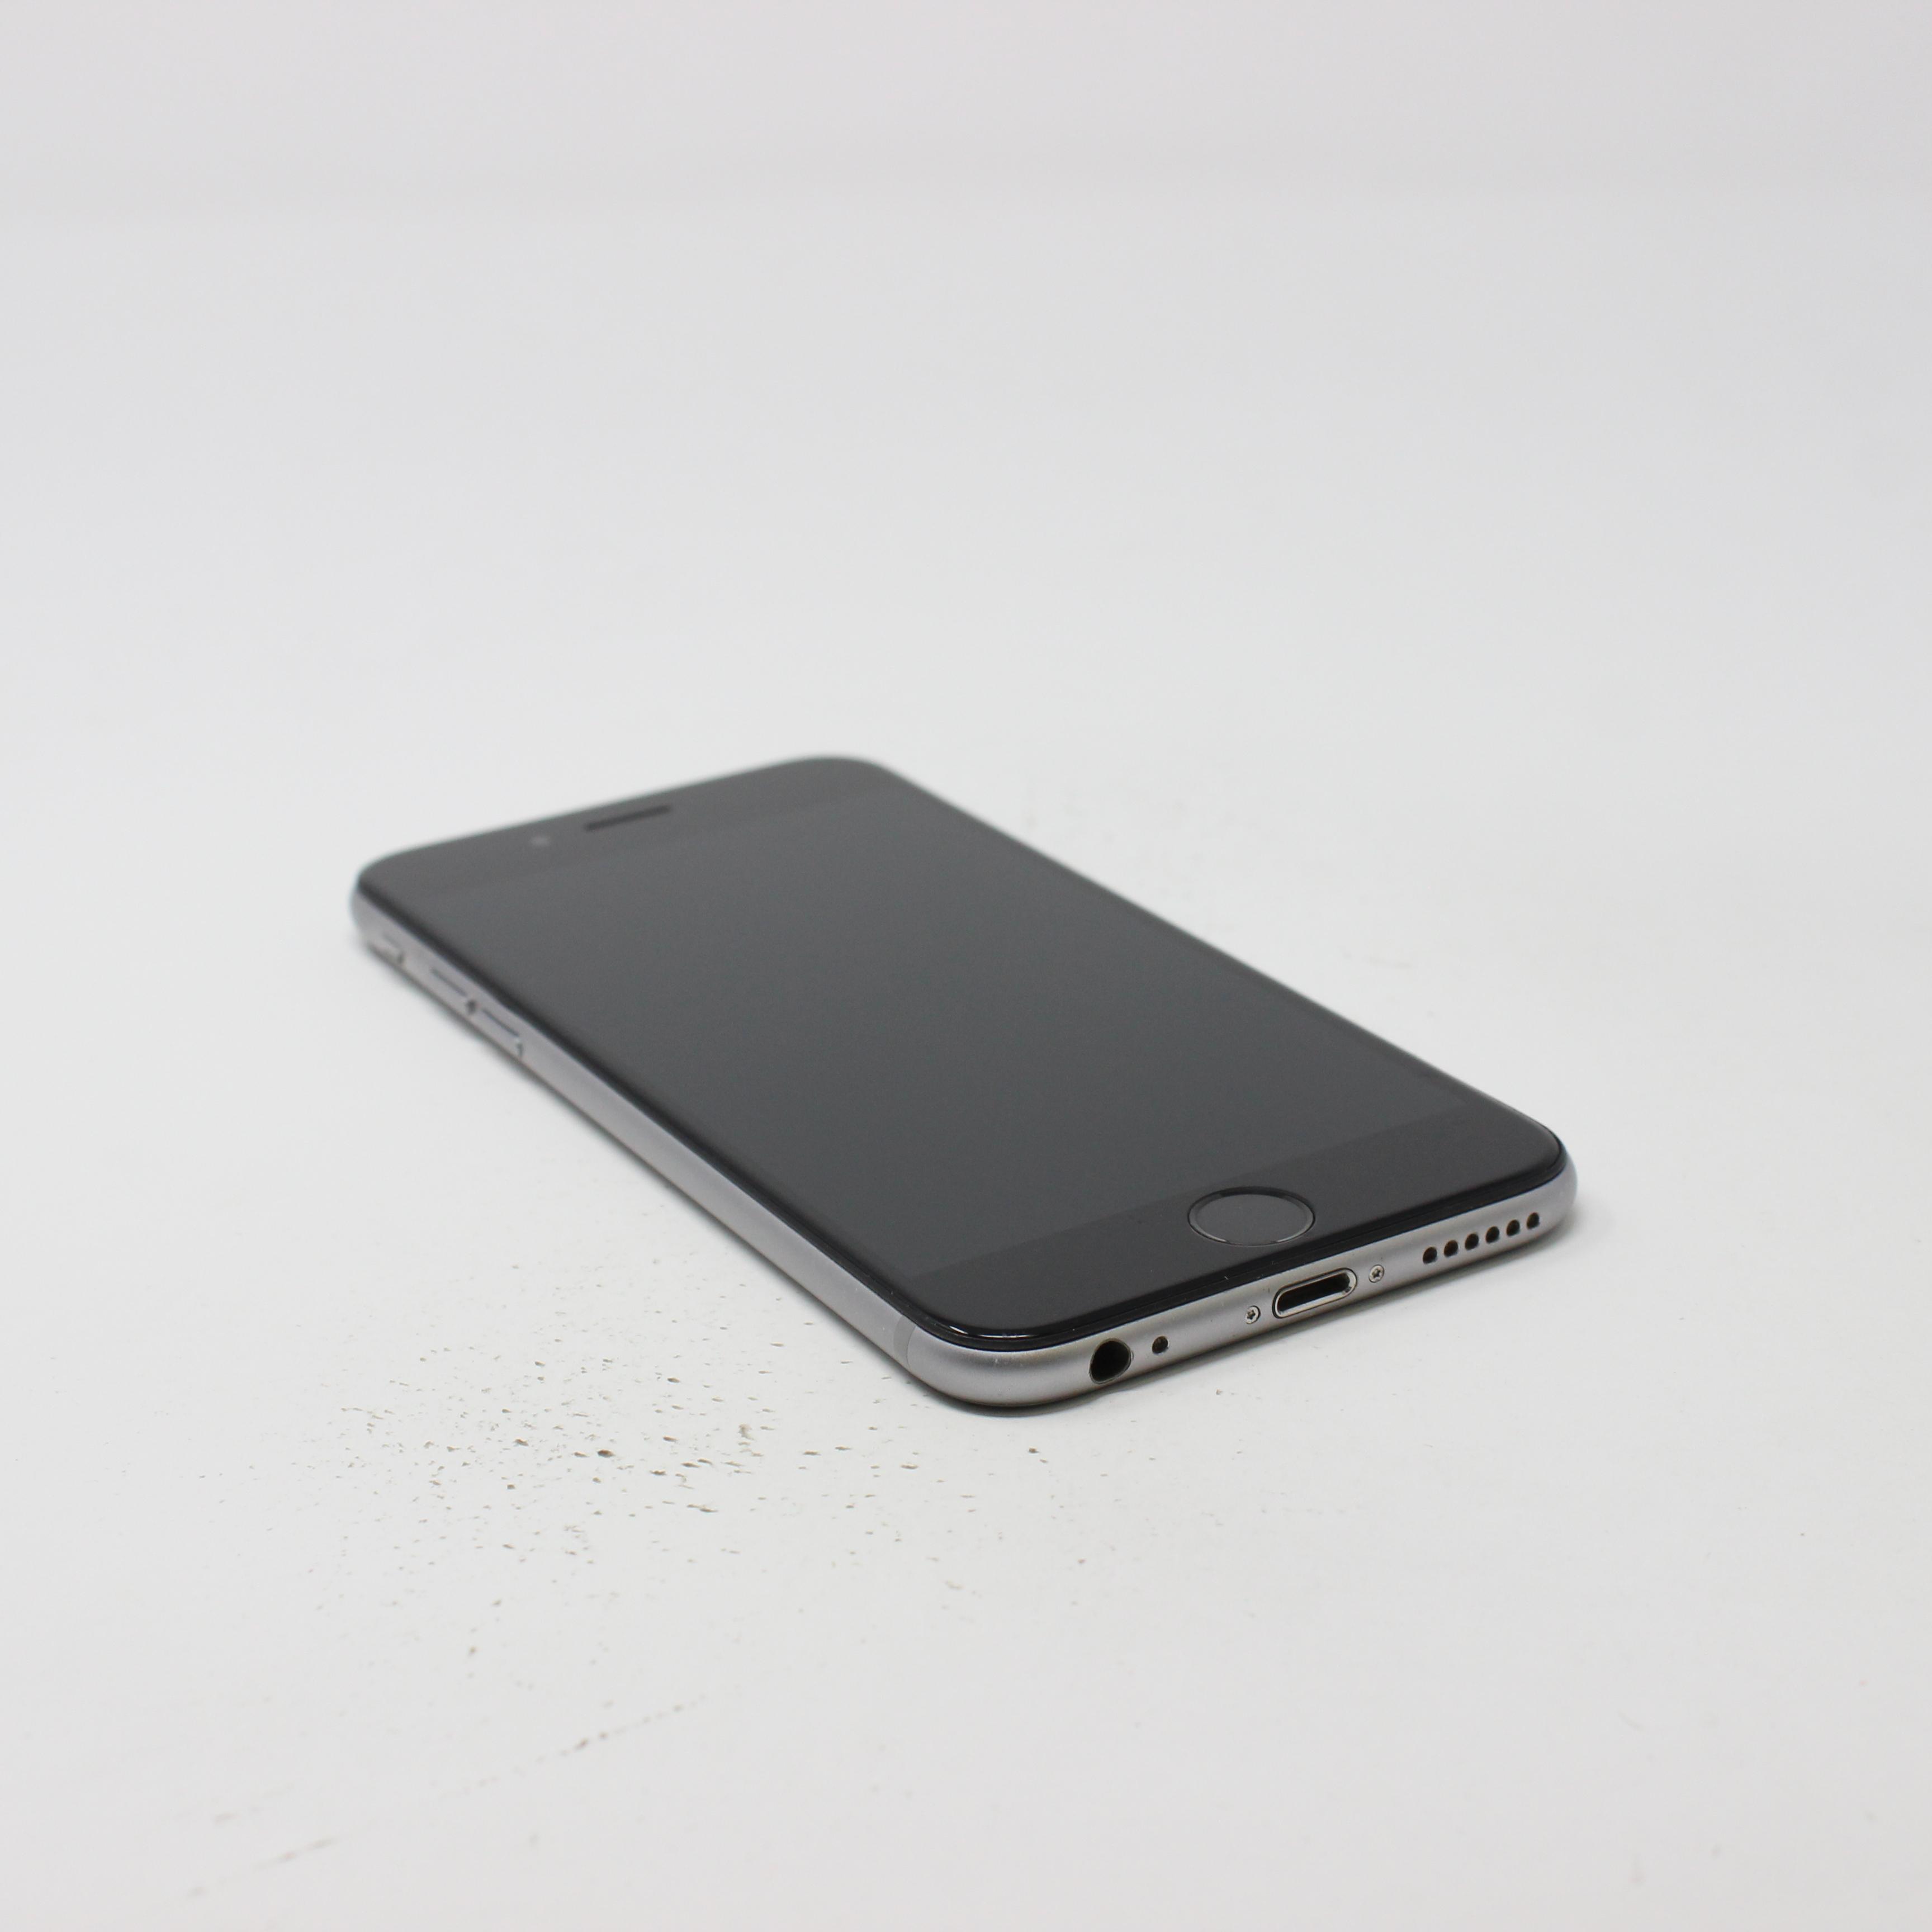 iPhone 6 16GB Space Gray - Verizon photo 5 | UpTradeit.com